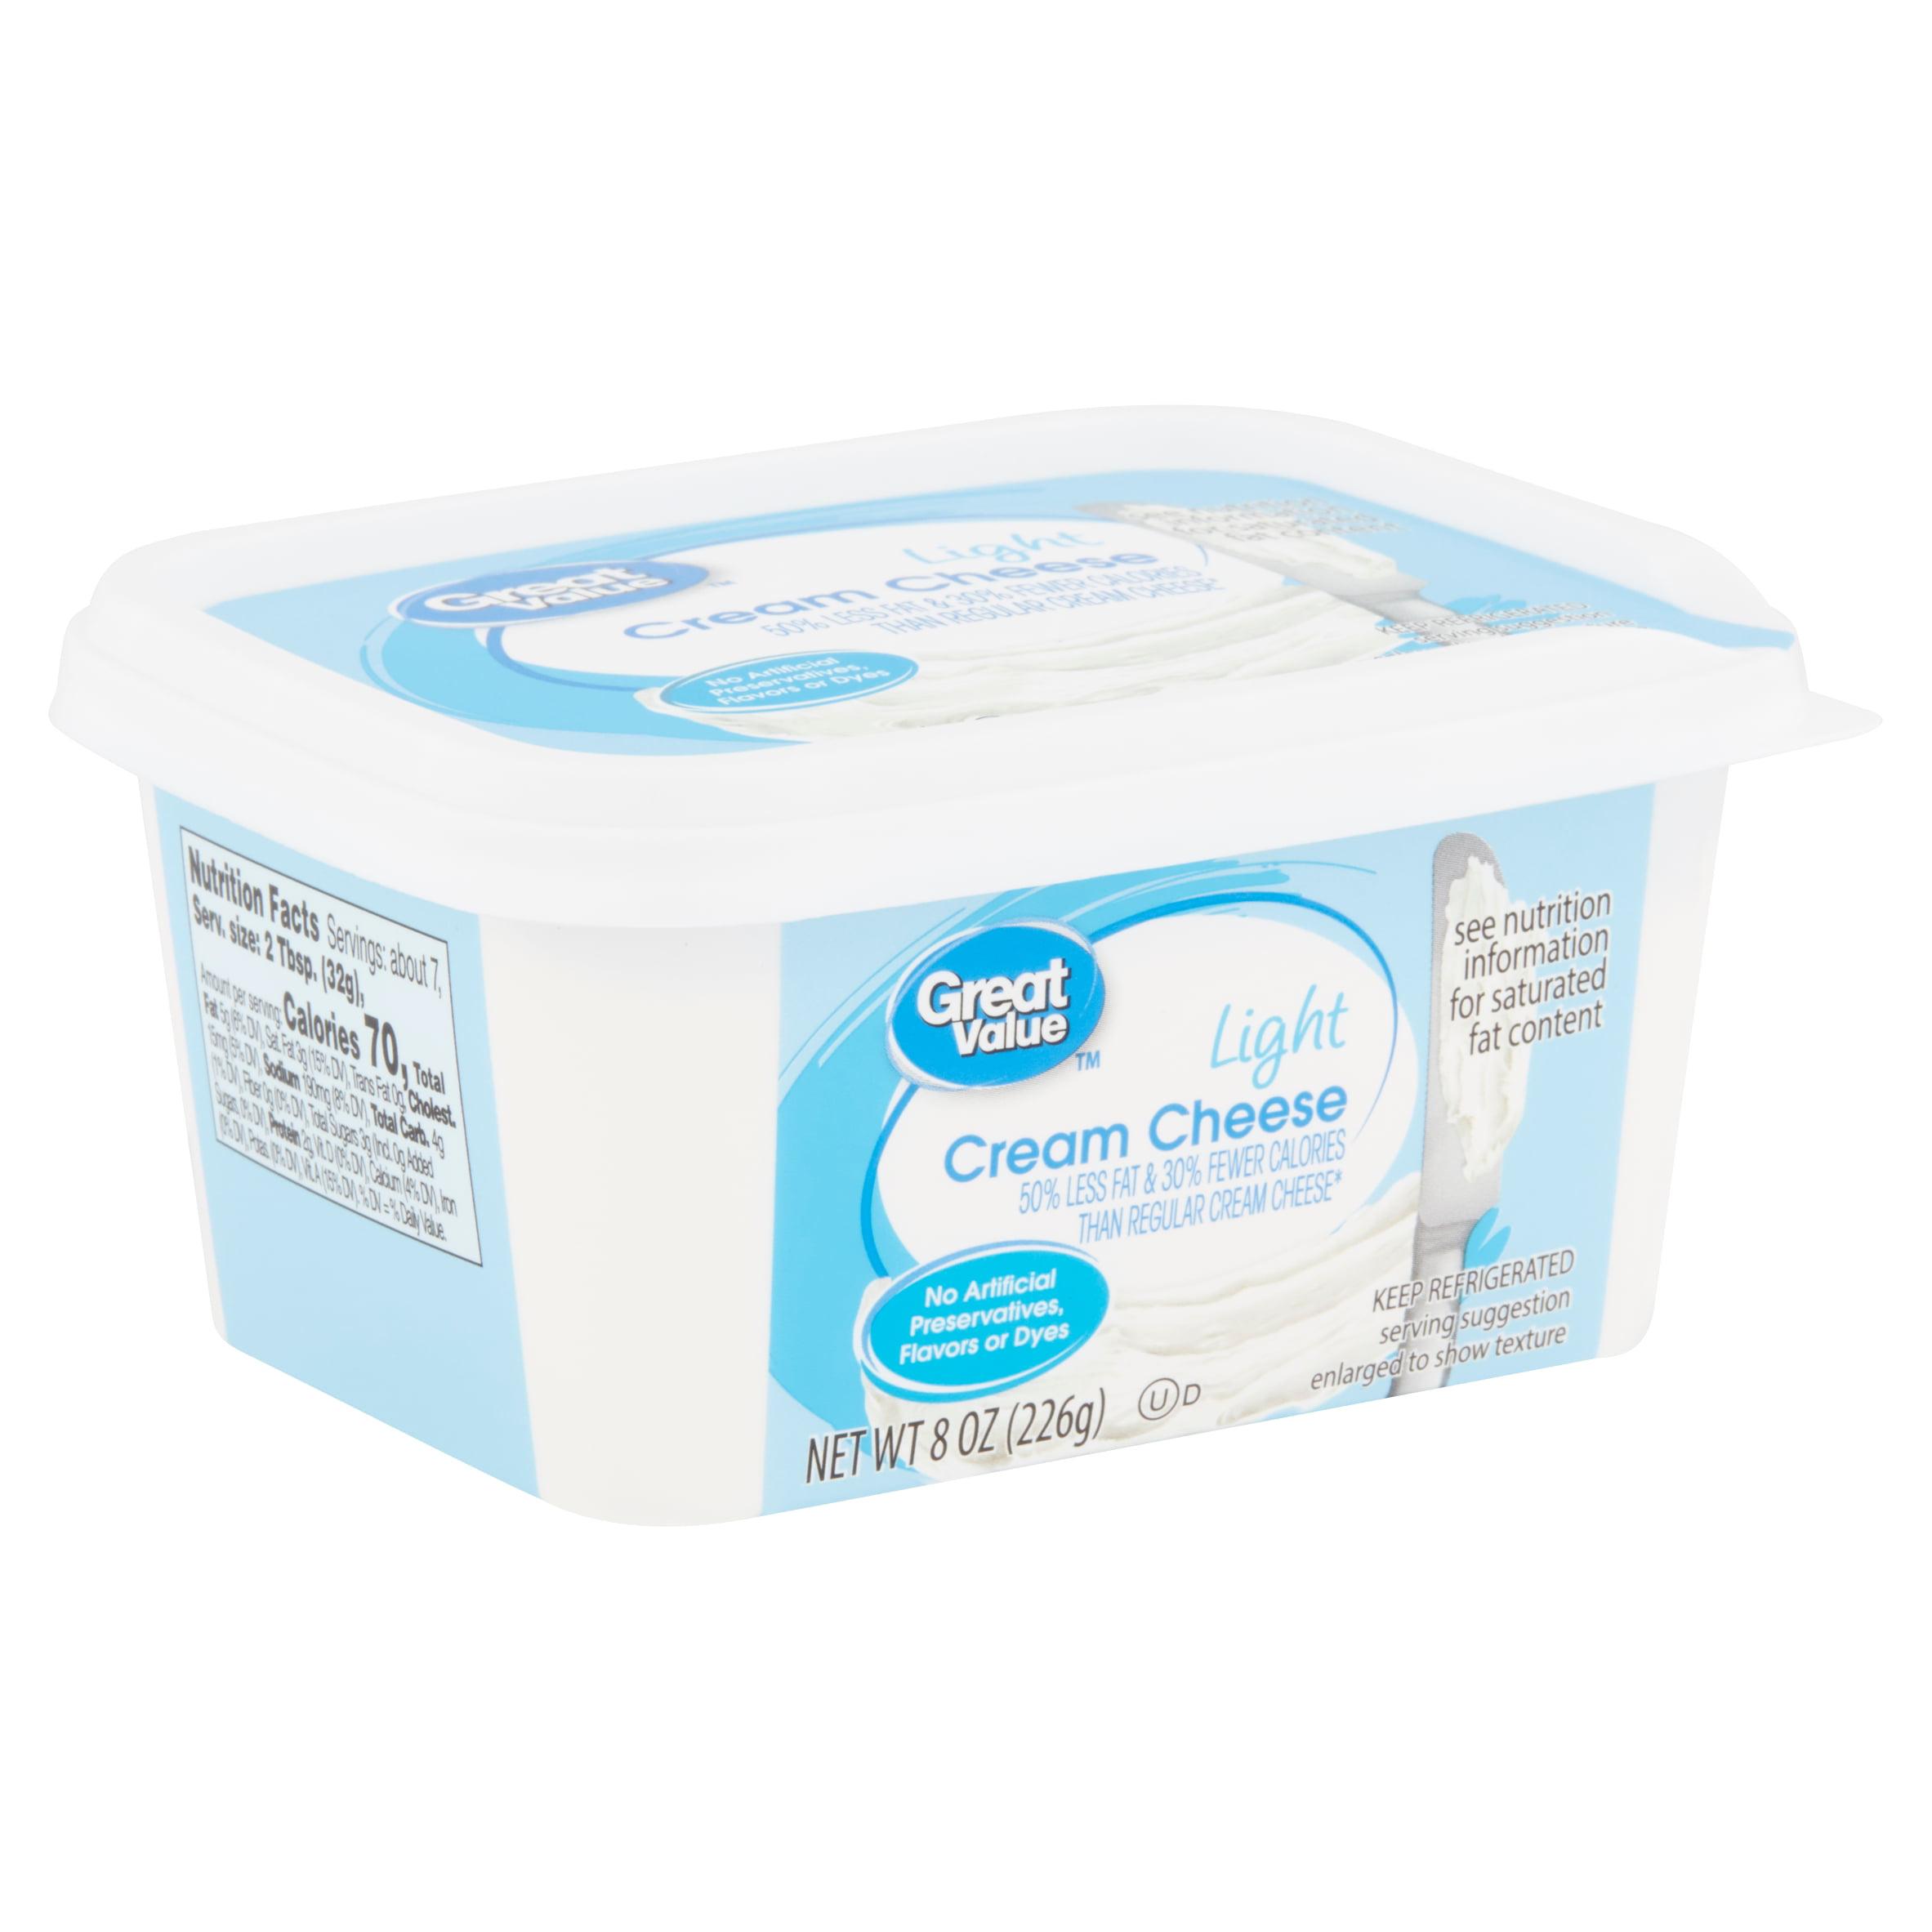 Great Value Light Cream Cheese, 8 oz